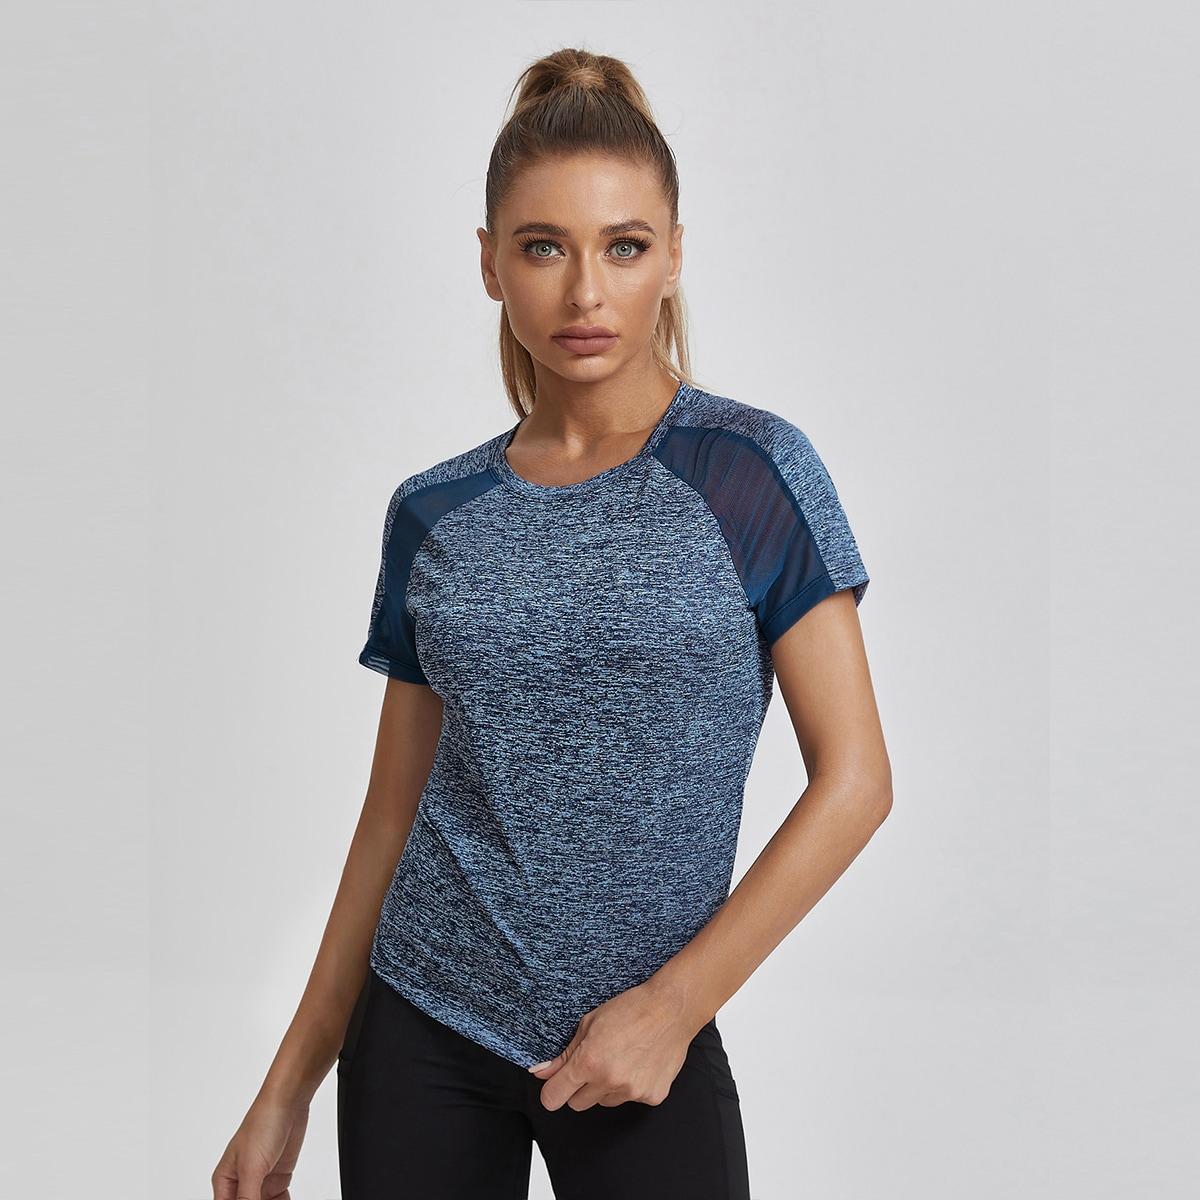 Спортивная футболка с рукавом реглан